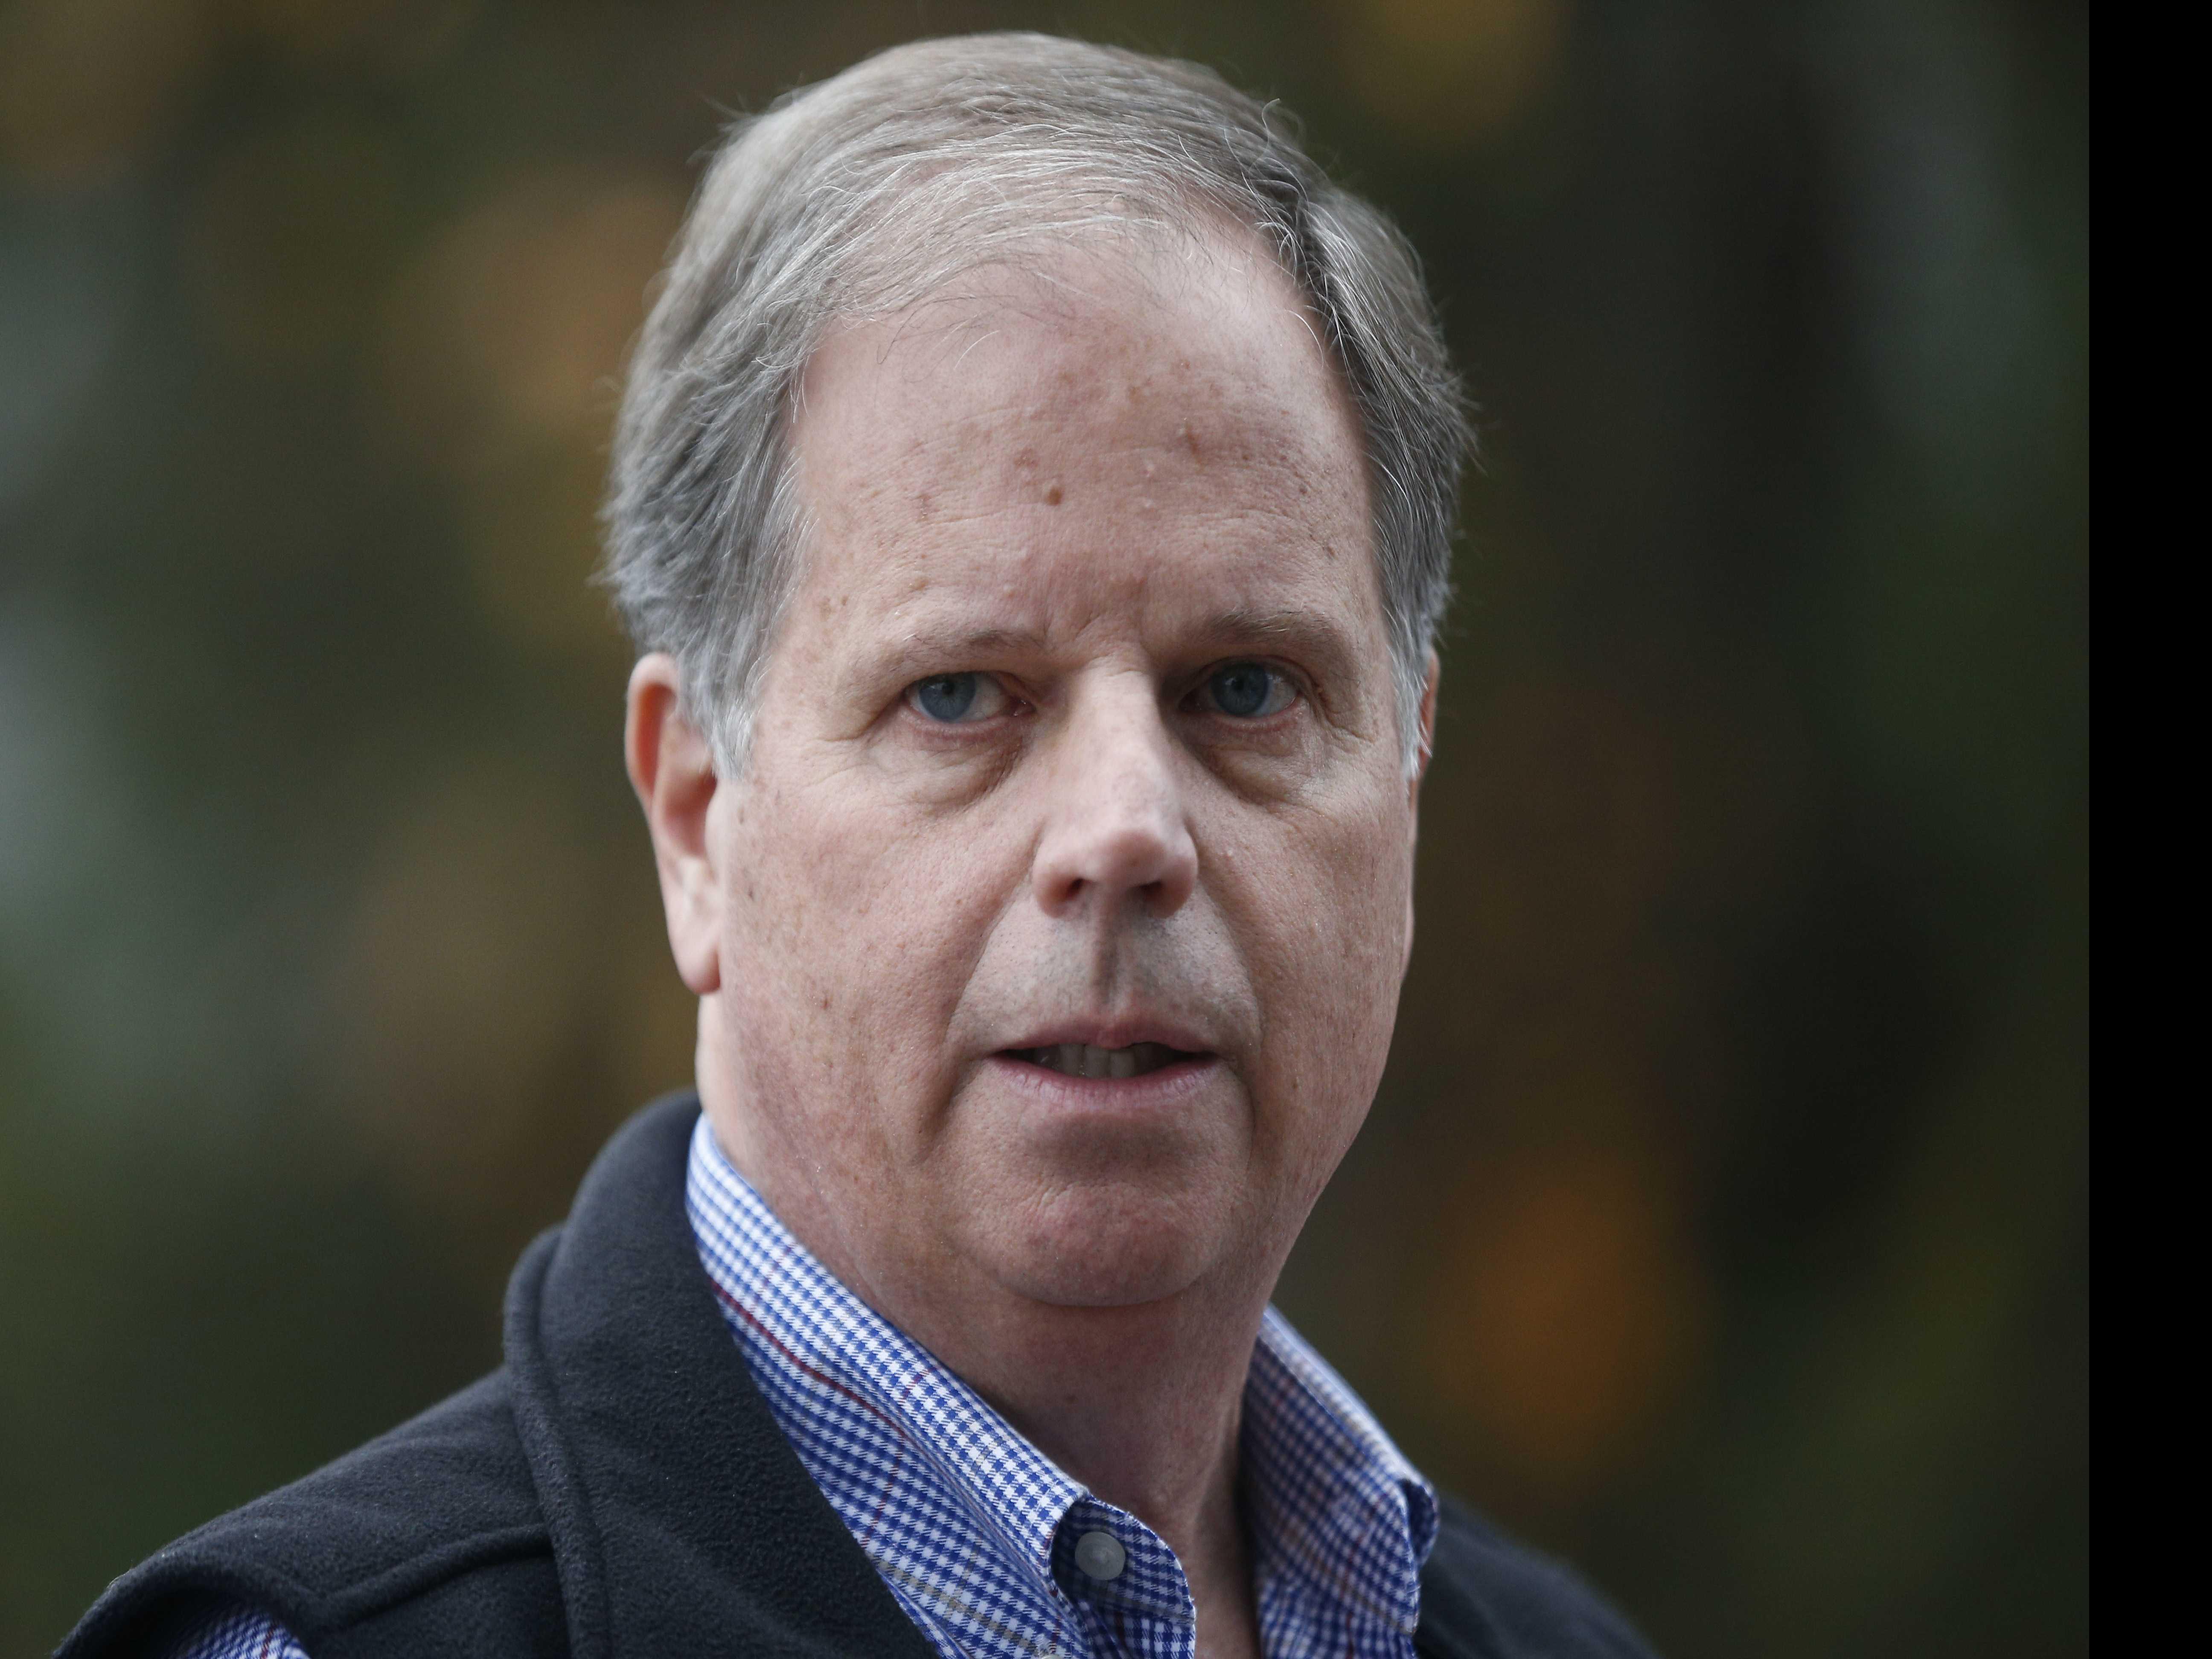 2 Democrats to be Sworn in as Senators, Narrow GOP Majority